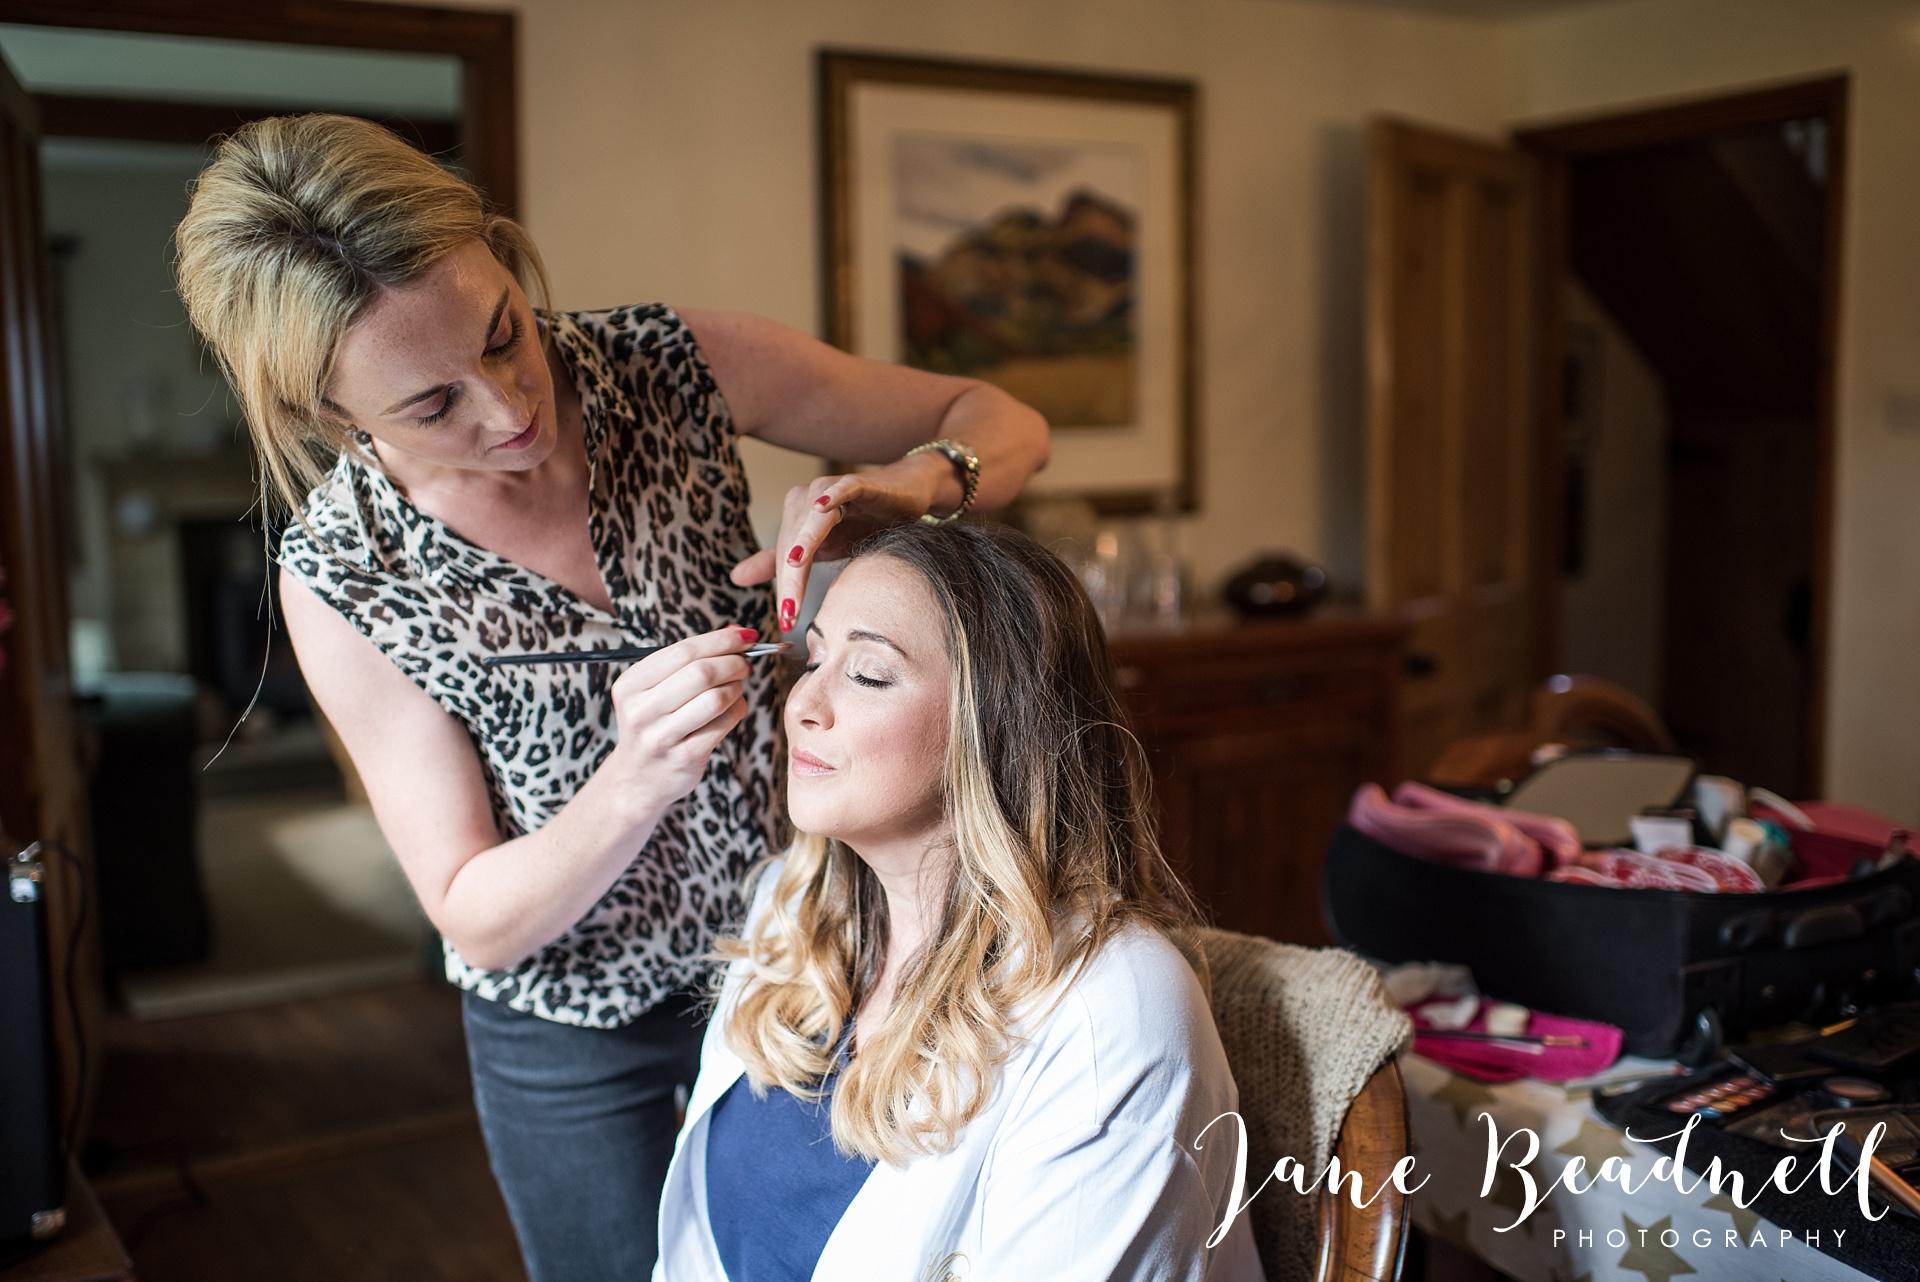 fine-art-wedding-photographer-jane-beadnell-yorkshire-wedding-photographer_0007